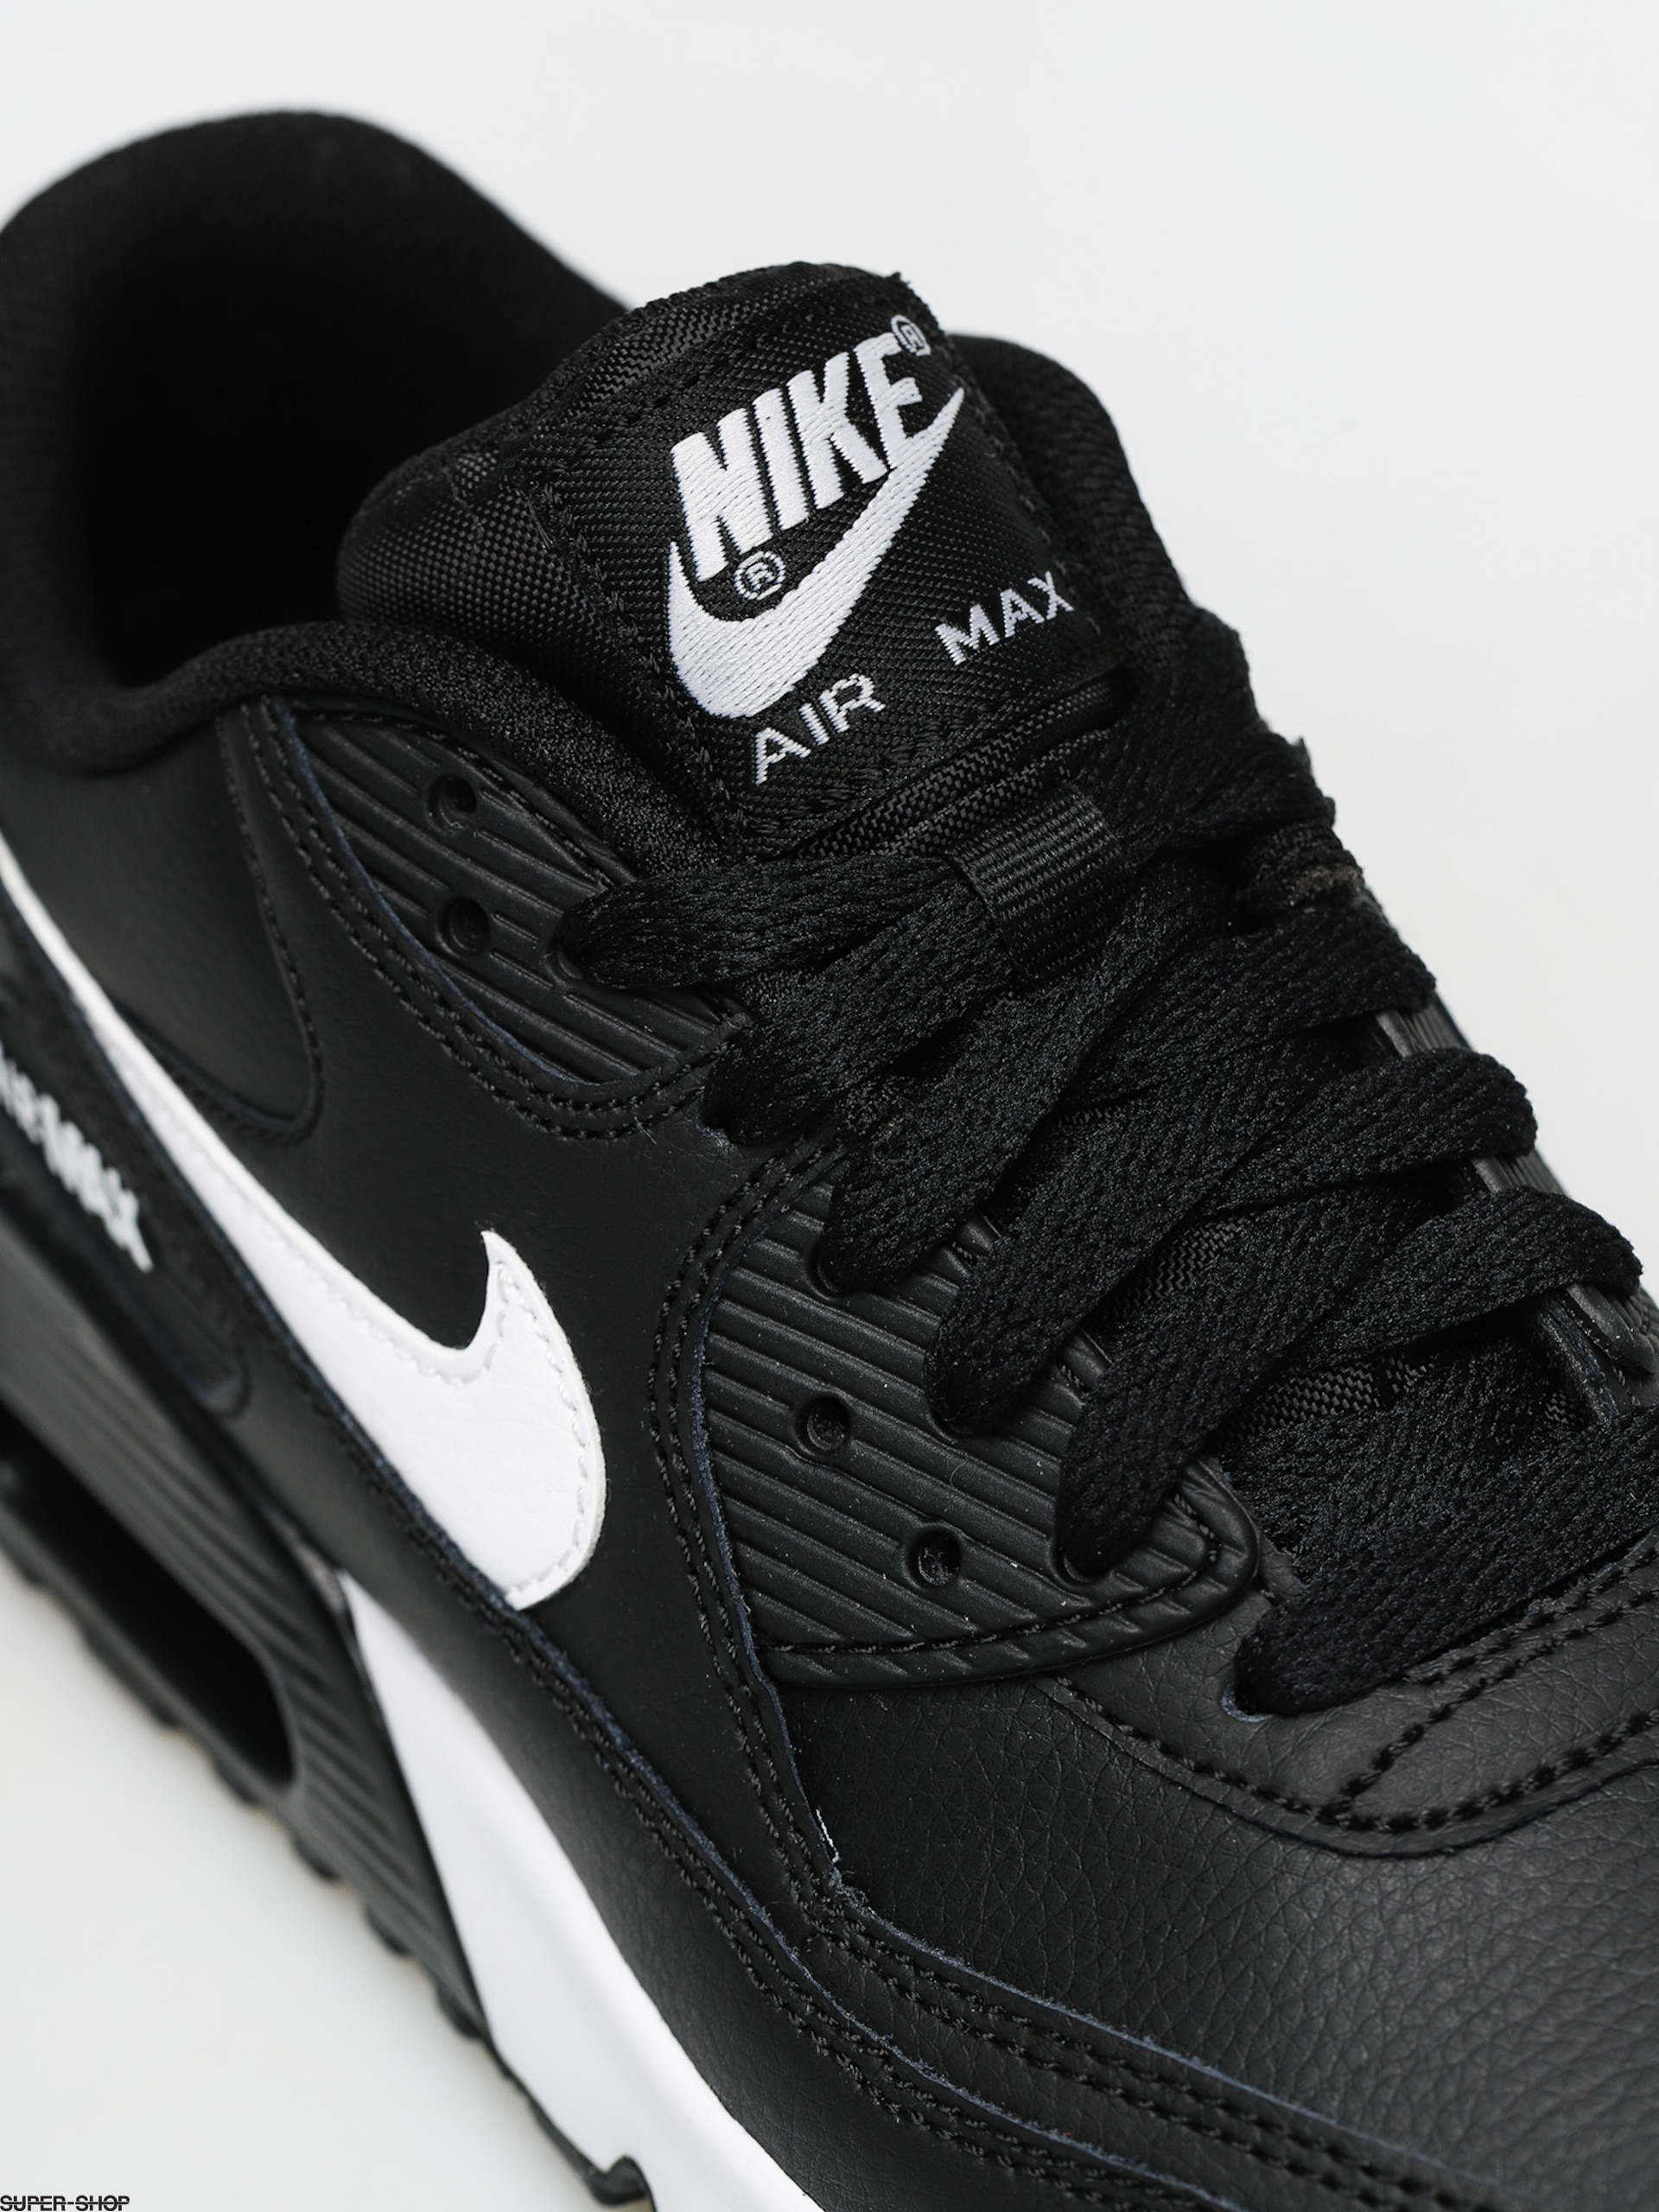 Nike Air Max 90 Ltr Gs Shoes (blackwhite anthracite)